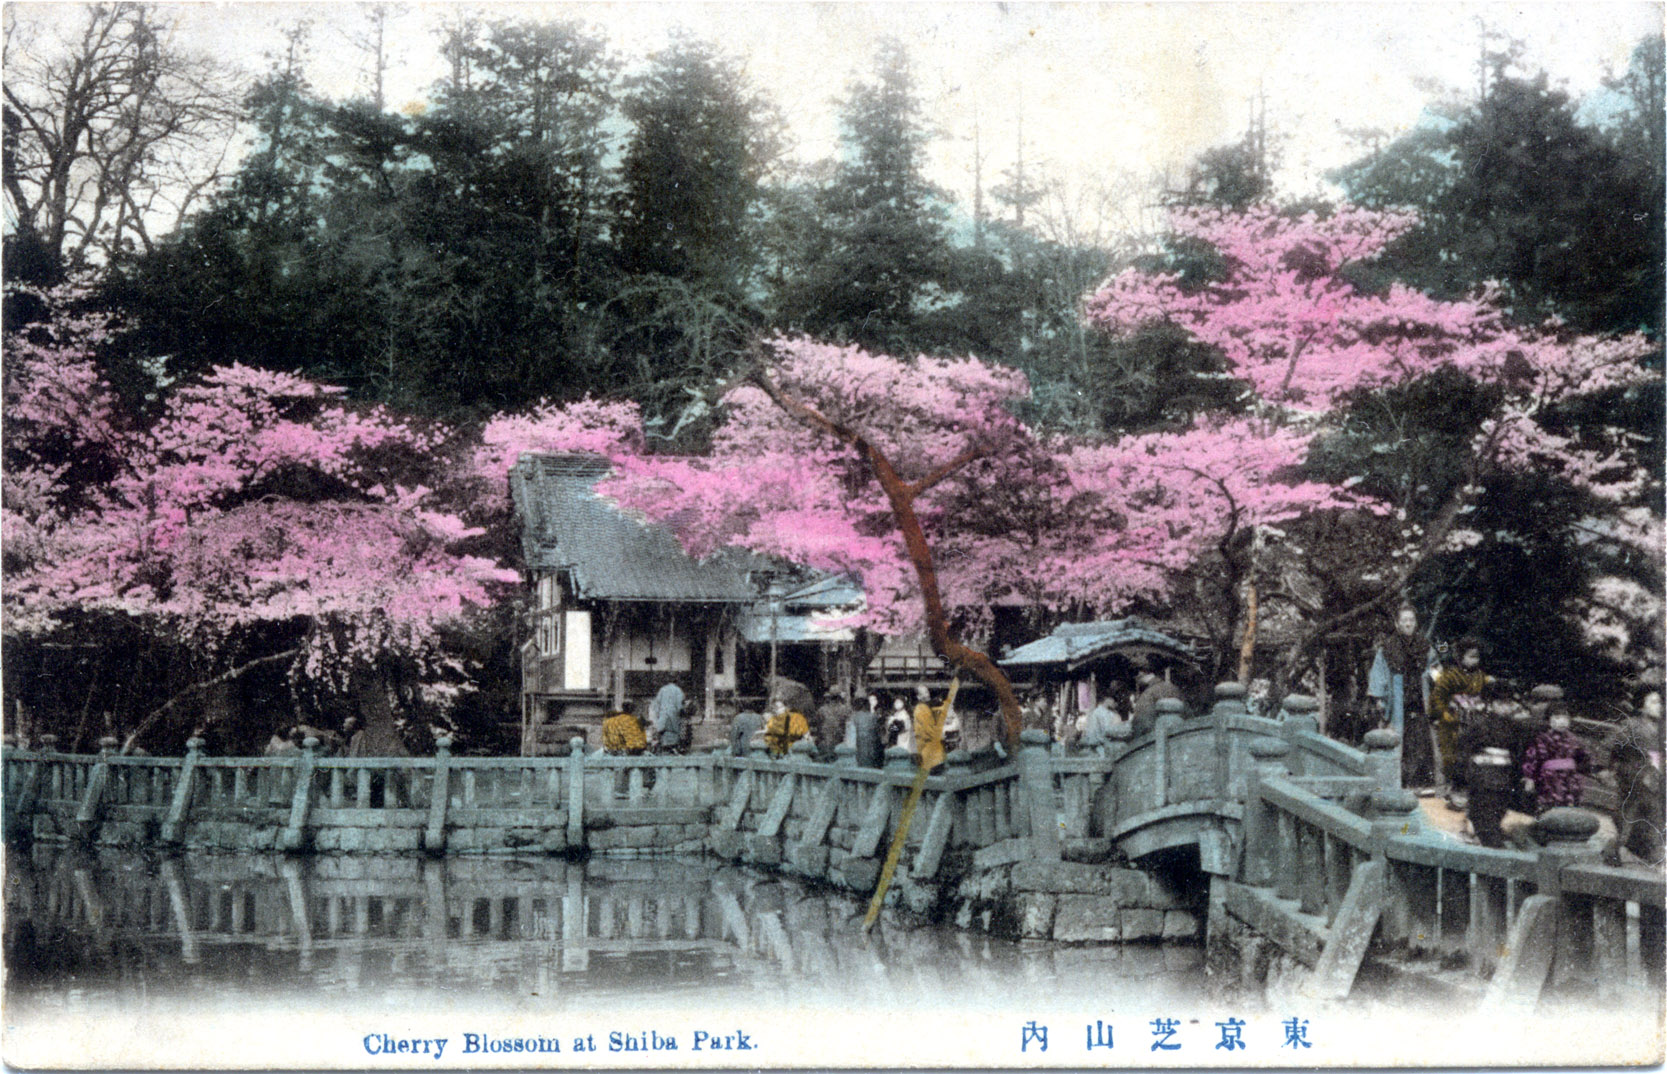 shiba-park-blossoms-pond-300.jpg